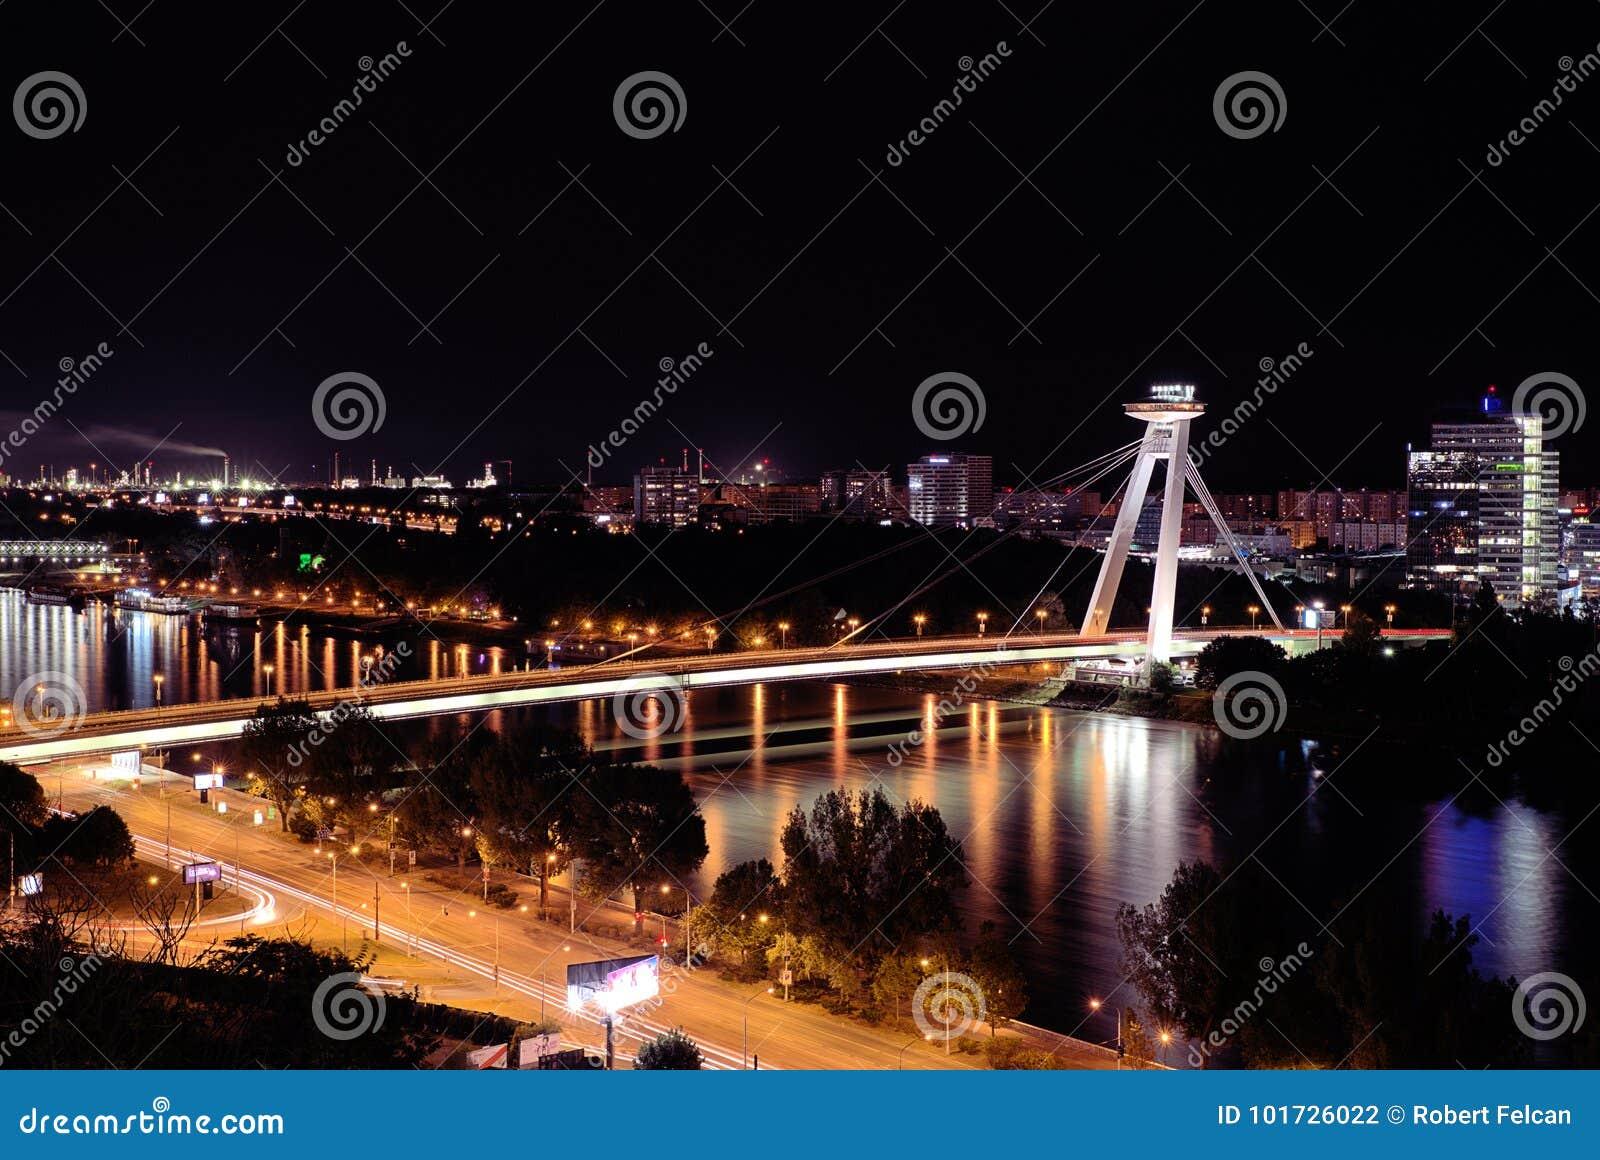 Ponte do Upraising nacional eslovaco, Danube River, capital Bratislava, Eslováquia